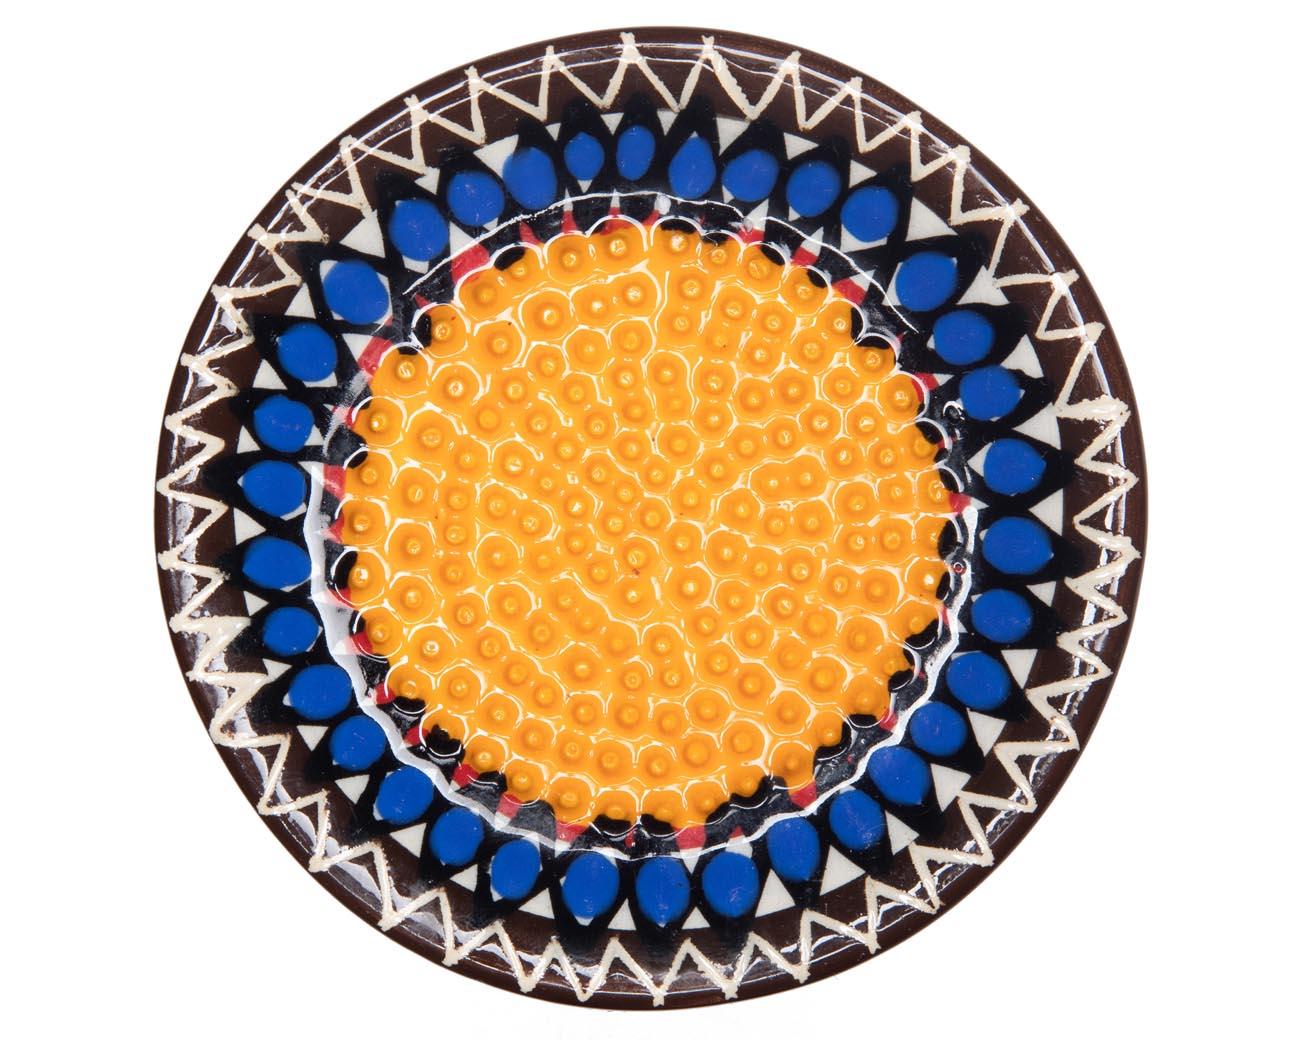 Keramikreibe - Freudentanz